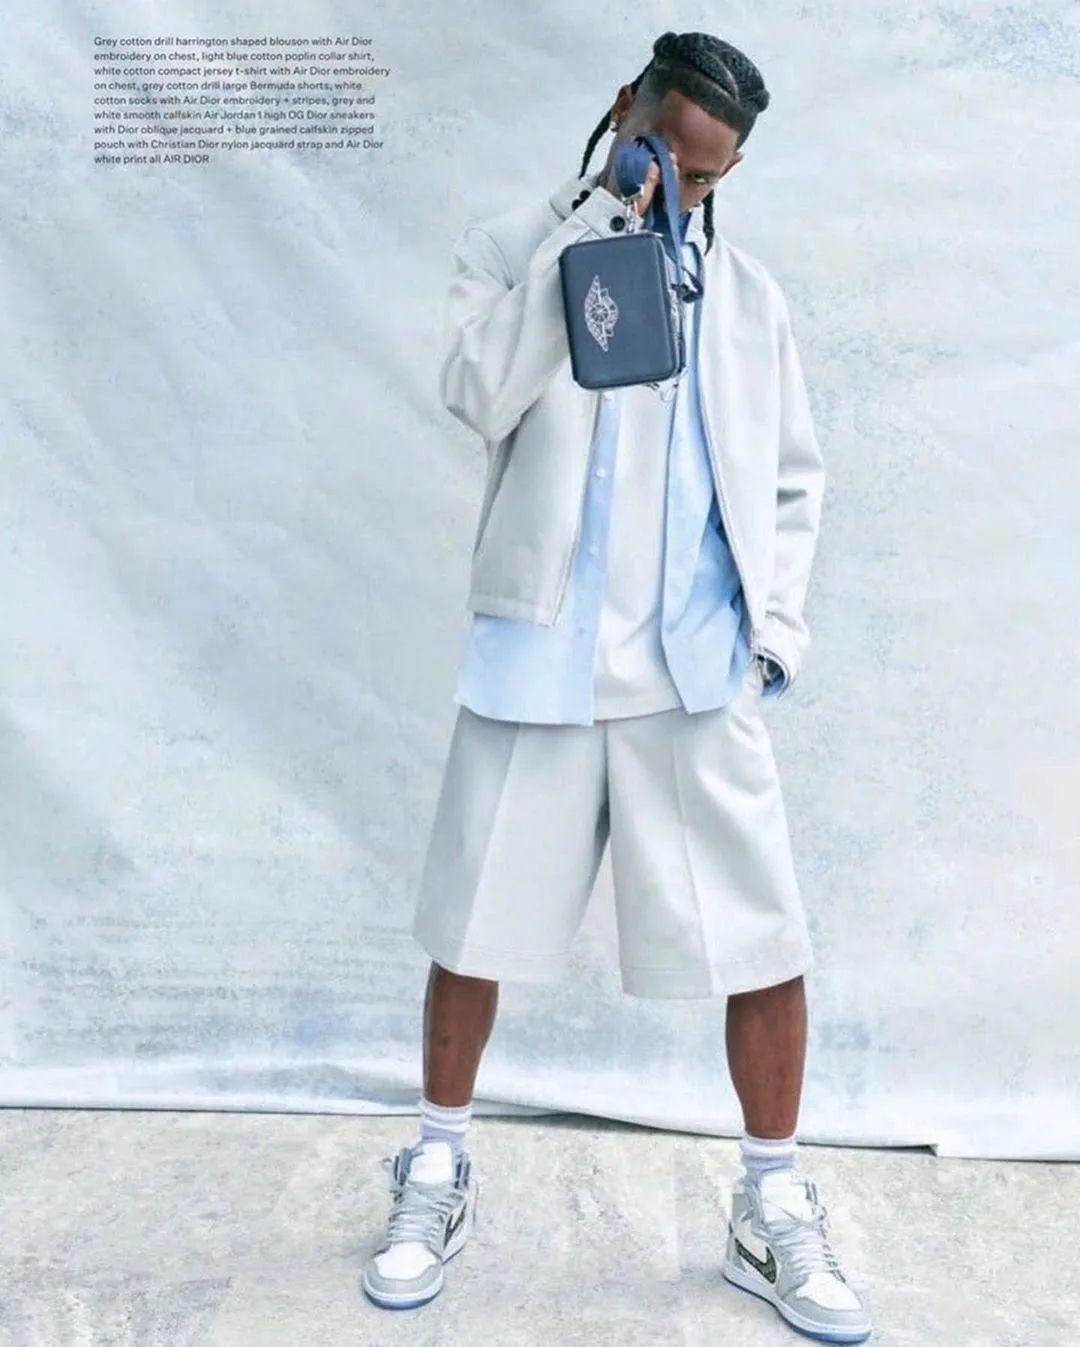 TS/王俊凯之后,Roddy Ricch上脚Dior x AJ1联名,要发售嘛?